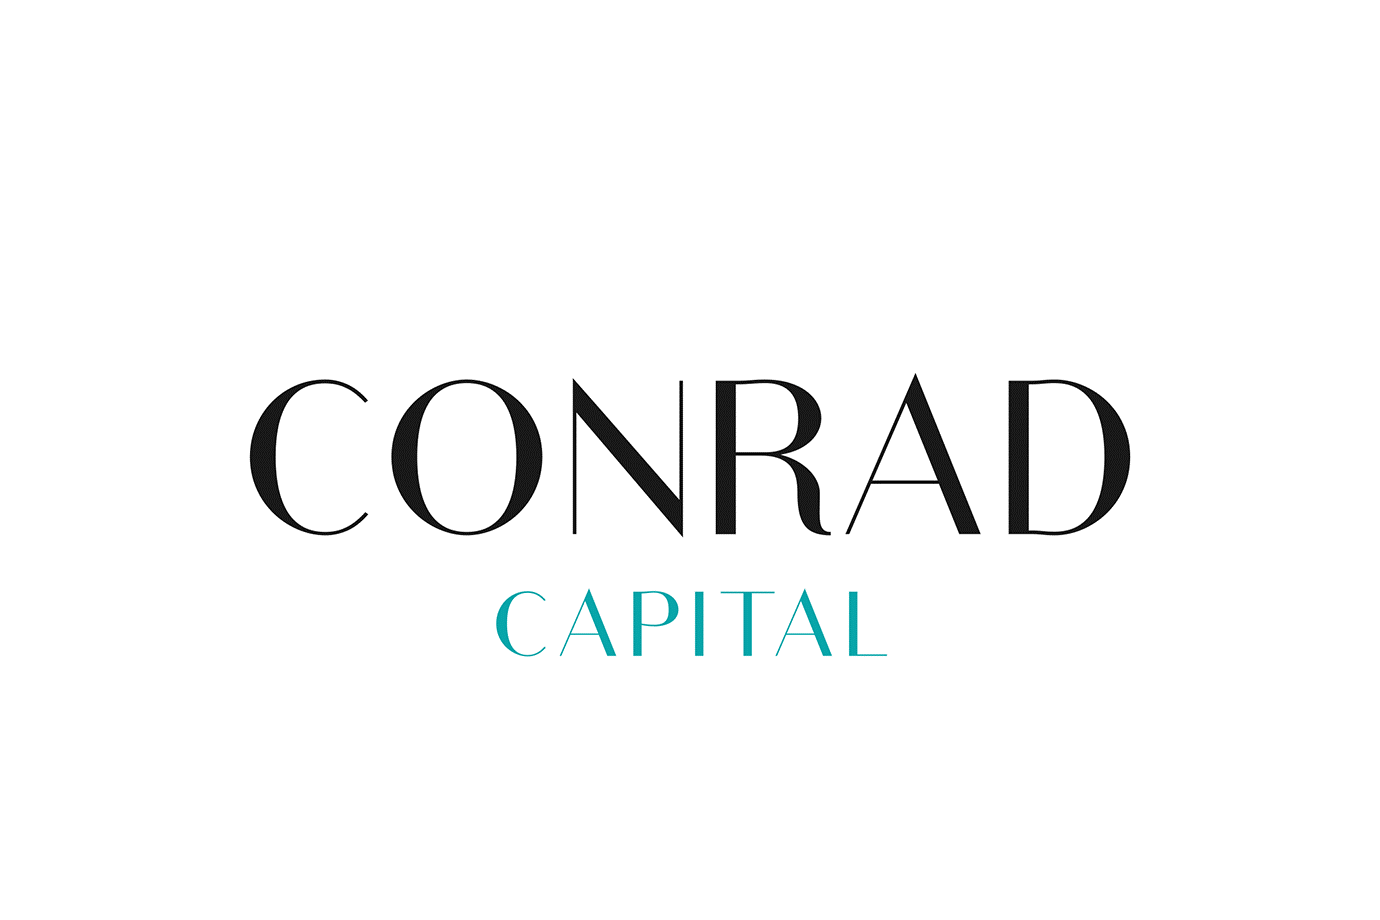 Conrad Capital